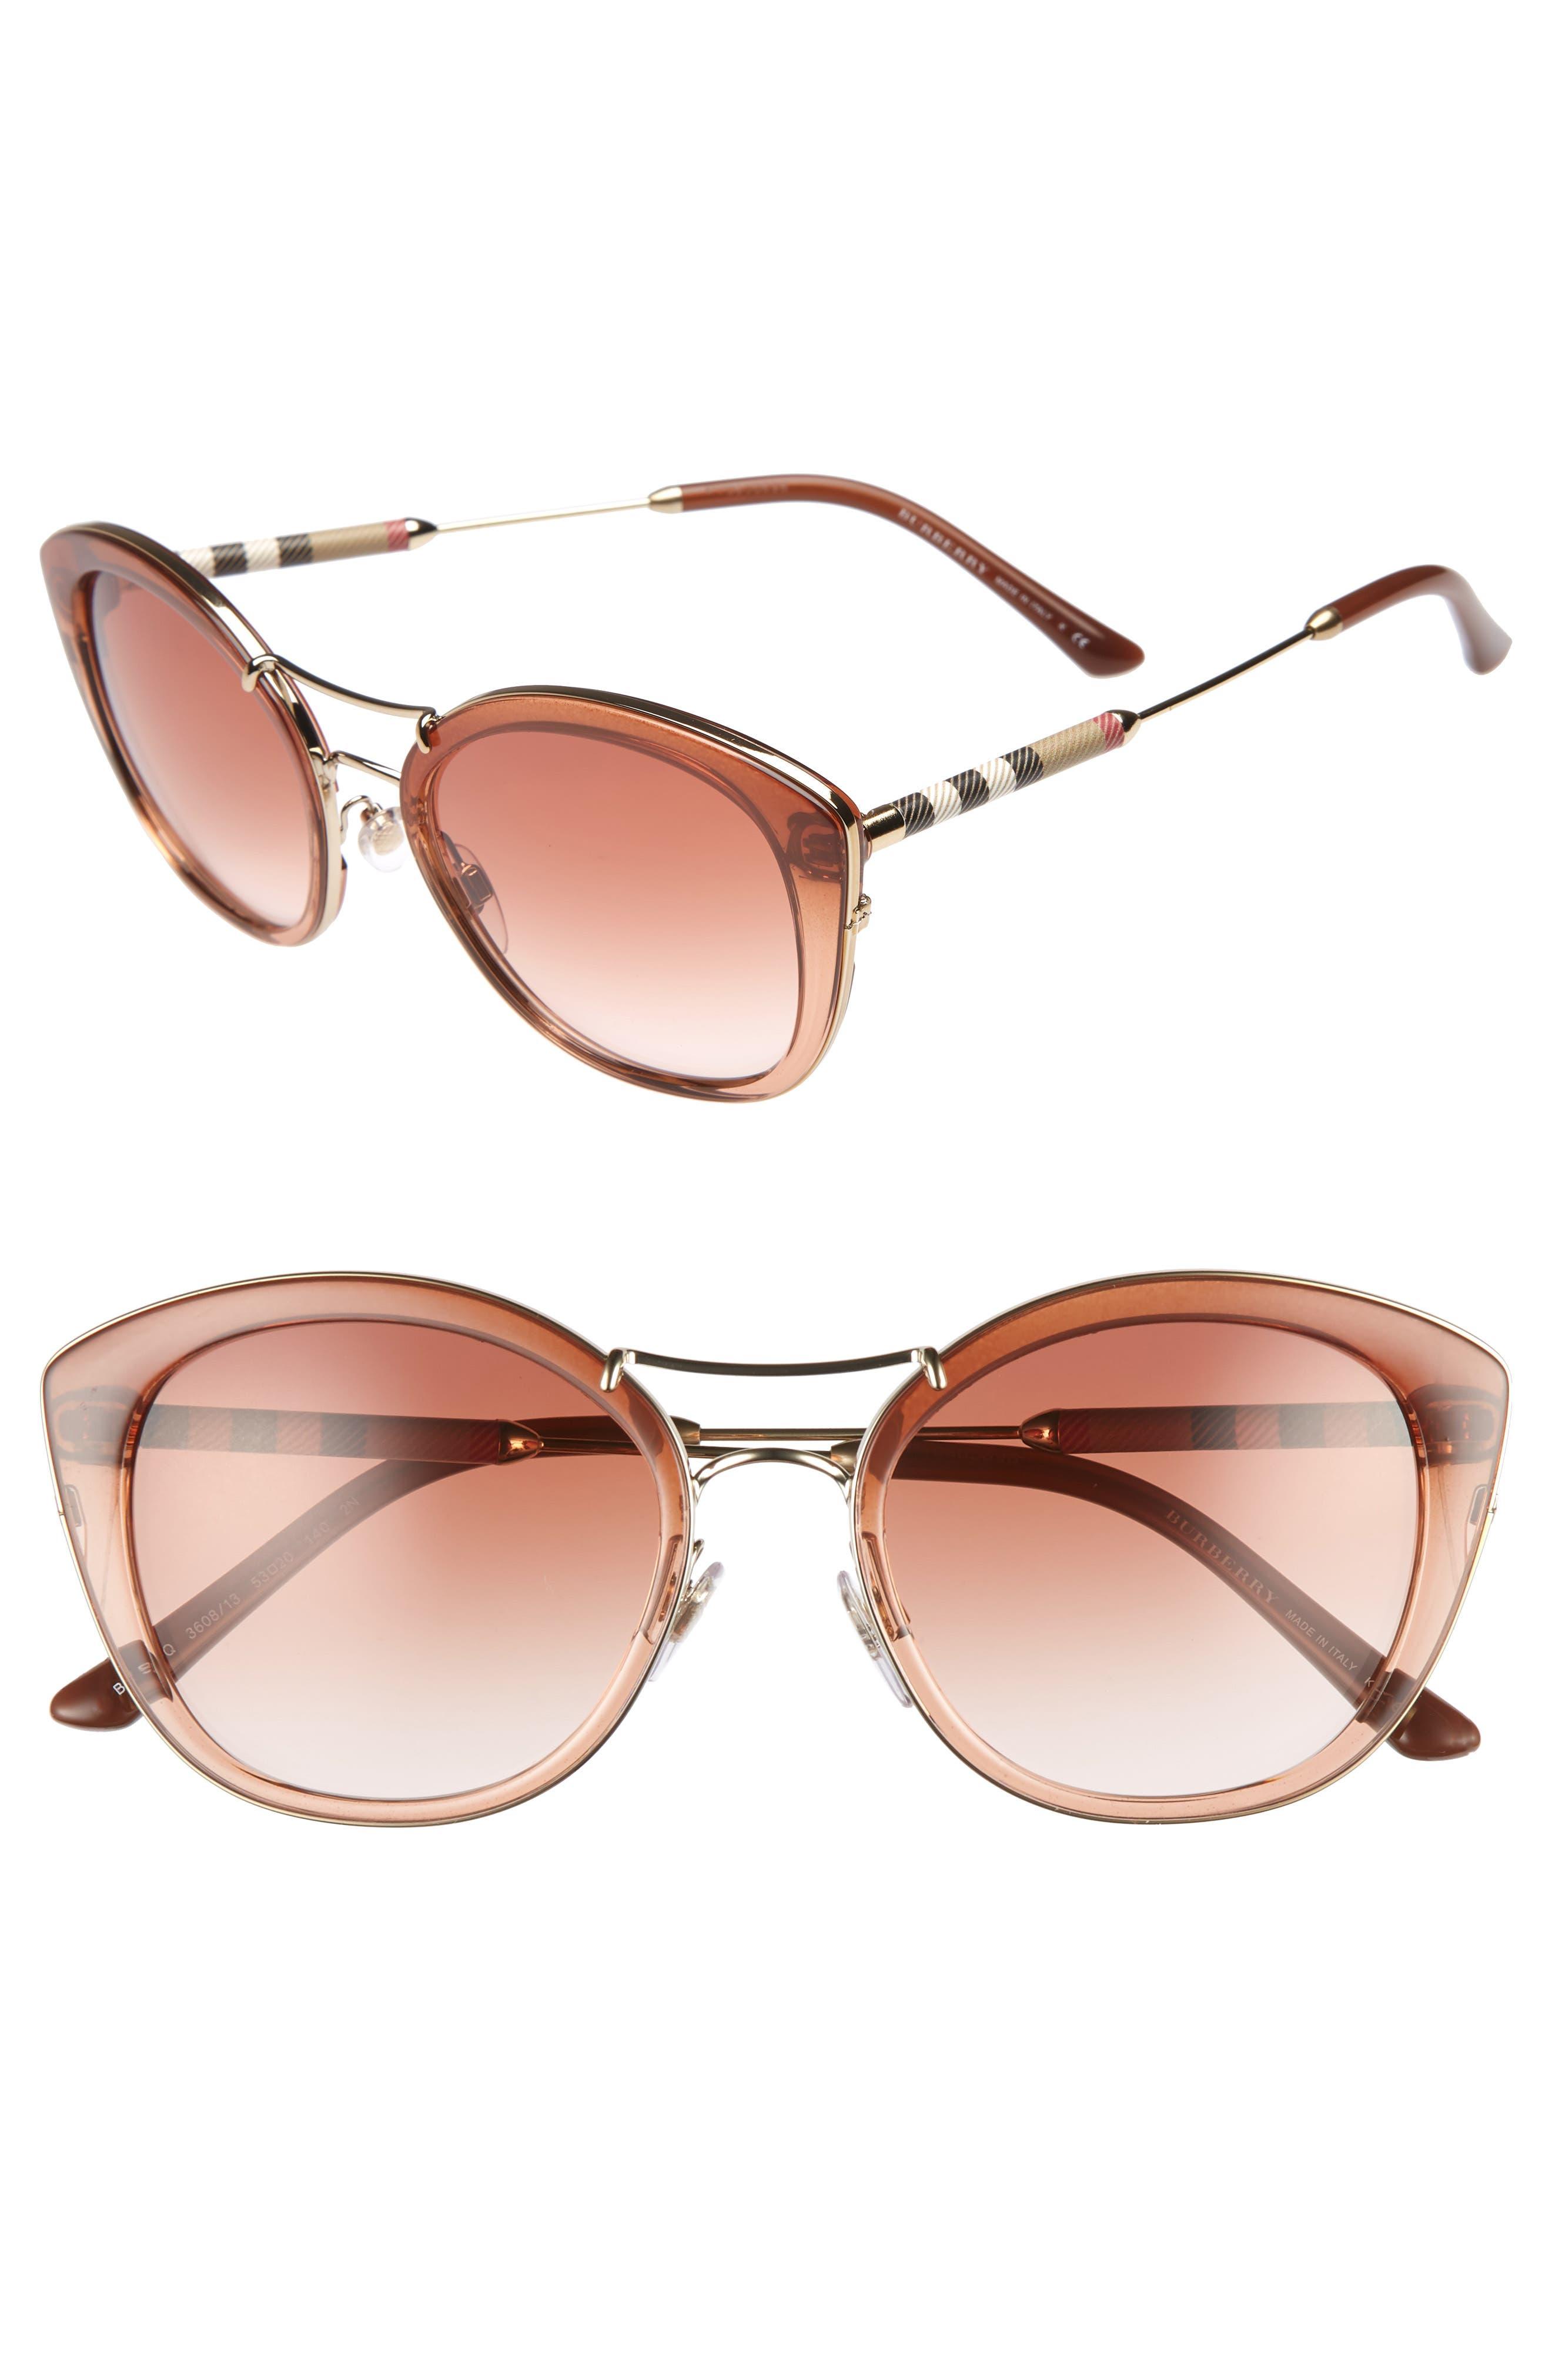 53mm Gradient Sunglasses,                         Main,                         color, BROWN GRADIENT